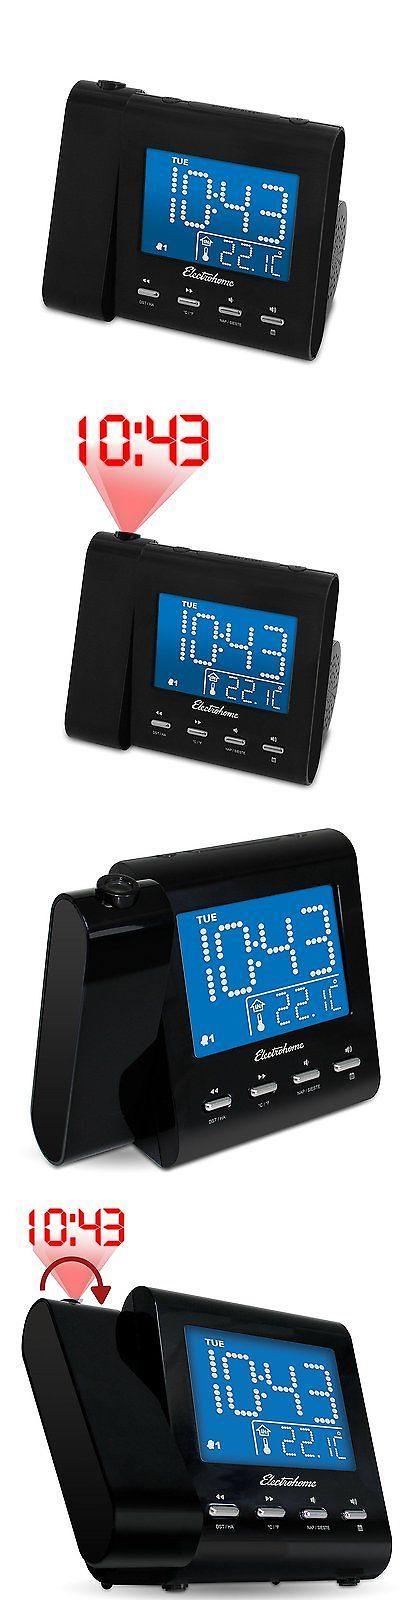 Digital Clocks and Clock Radios: Wall Projector Dual Alarm Clock Radio Music Audio Lcd Digital Display Watches -> BUY IT NOW ONLY: $31.42 on eBay!